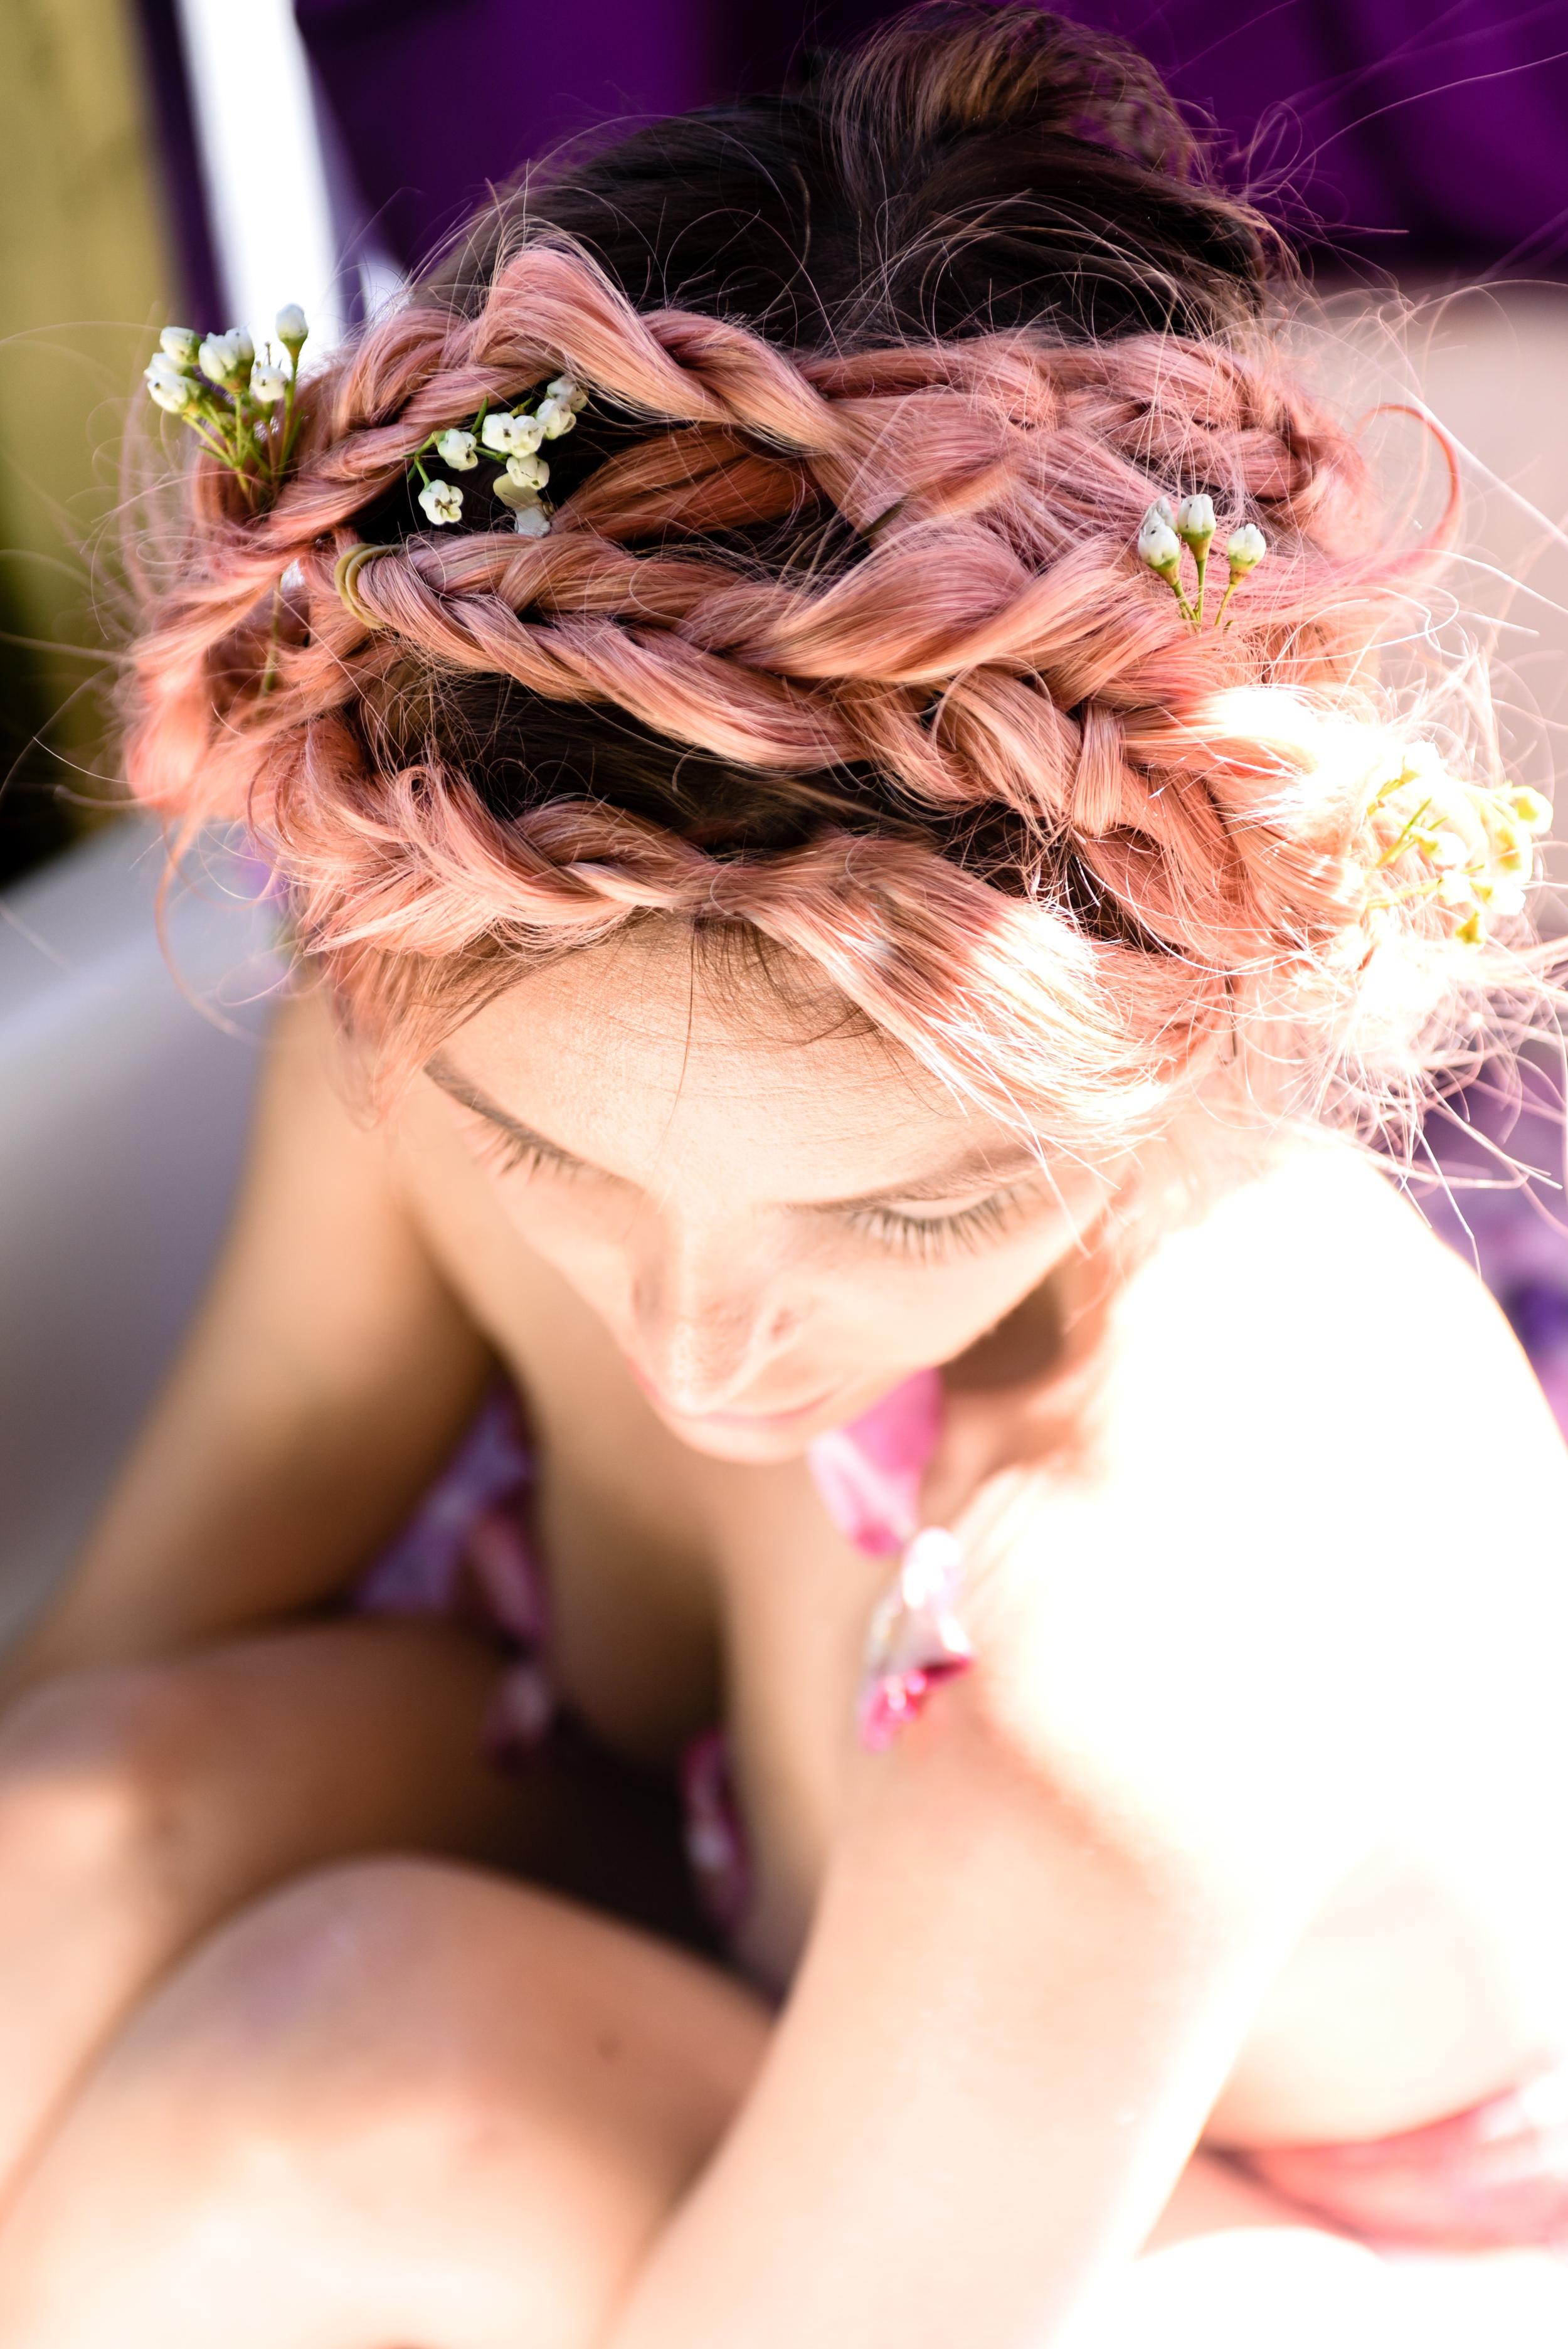 rose bath, milk bath, flores lane candles, boho bunnie, joshua tree, rose petal bath, milky bath shoot, pink hair, overtone hair pink, pastel pink hair